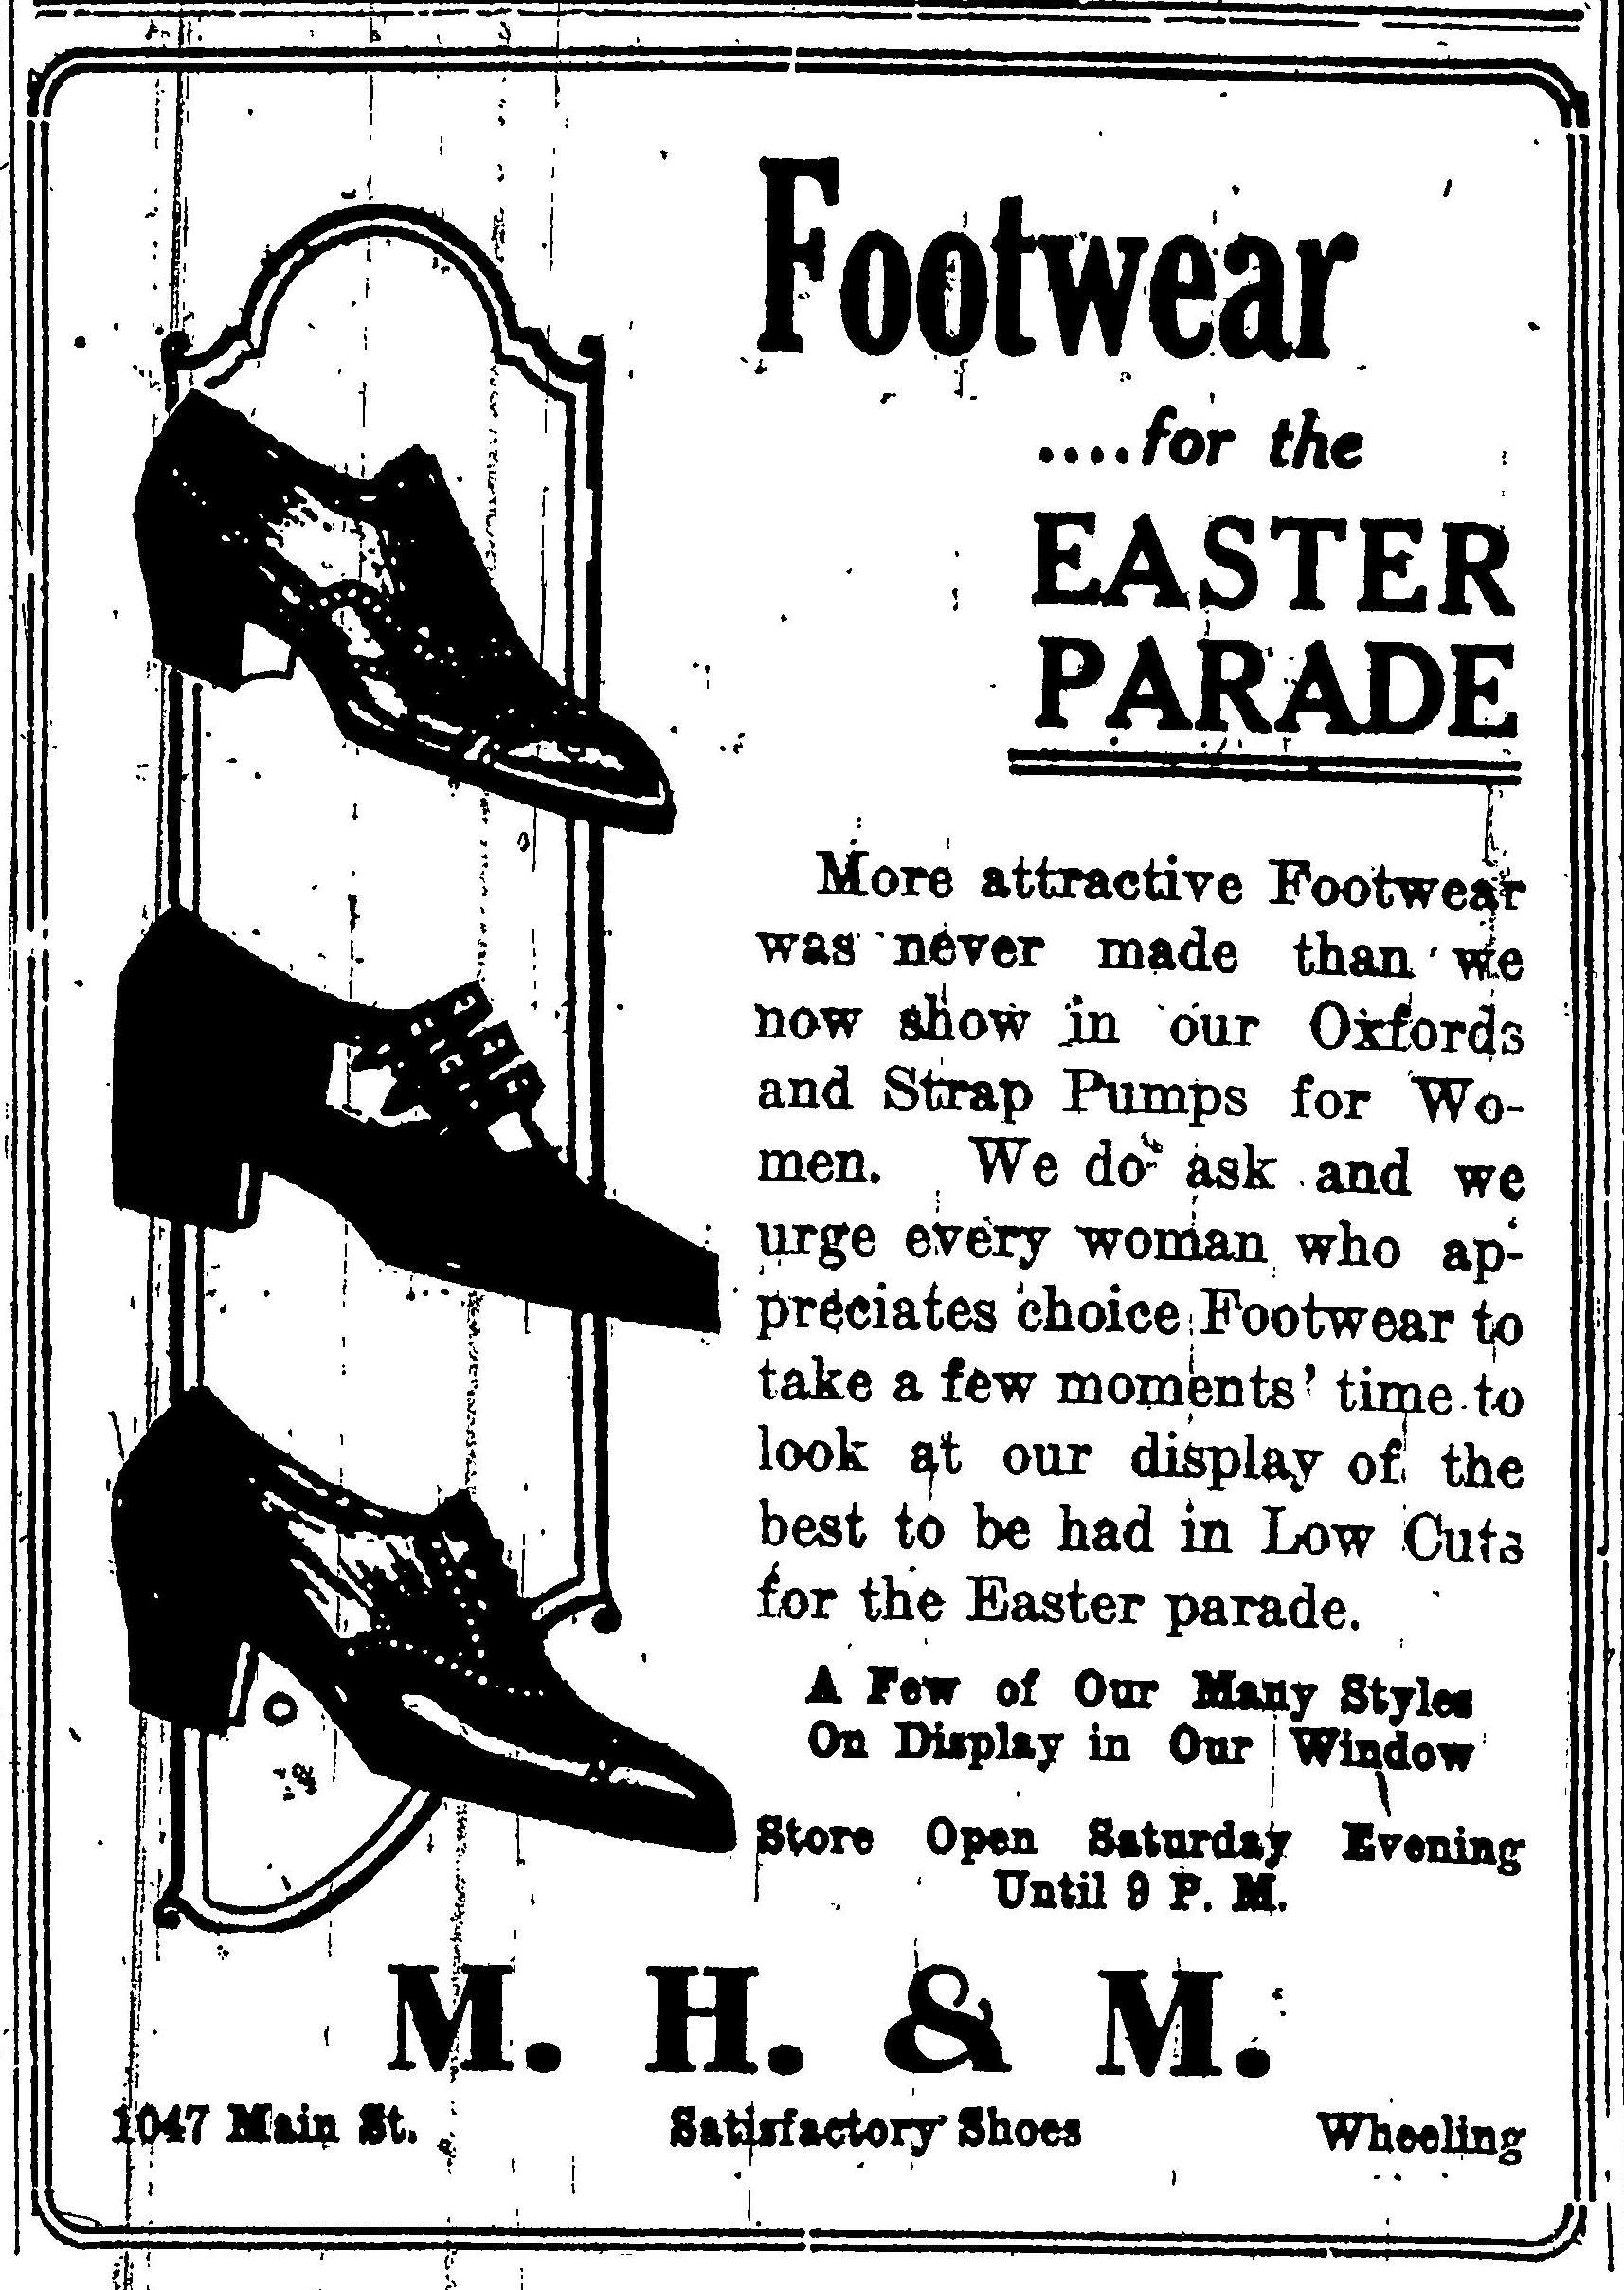 M.H. & M. Satisfactory Shoes - Wheeling Intelligencer, April 15, 1922